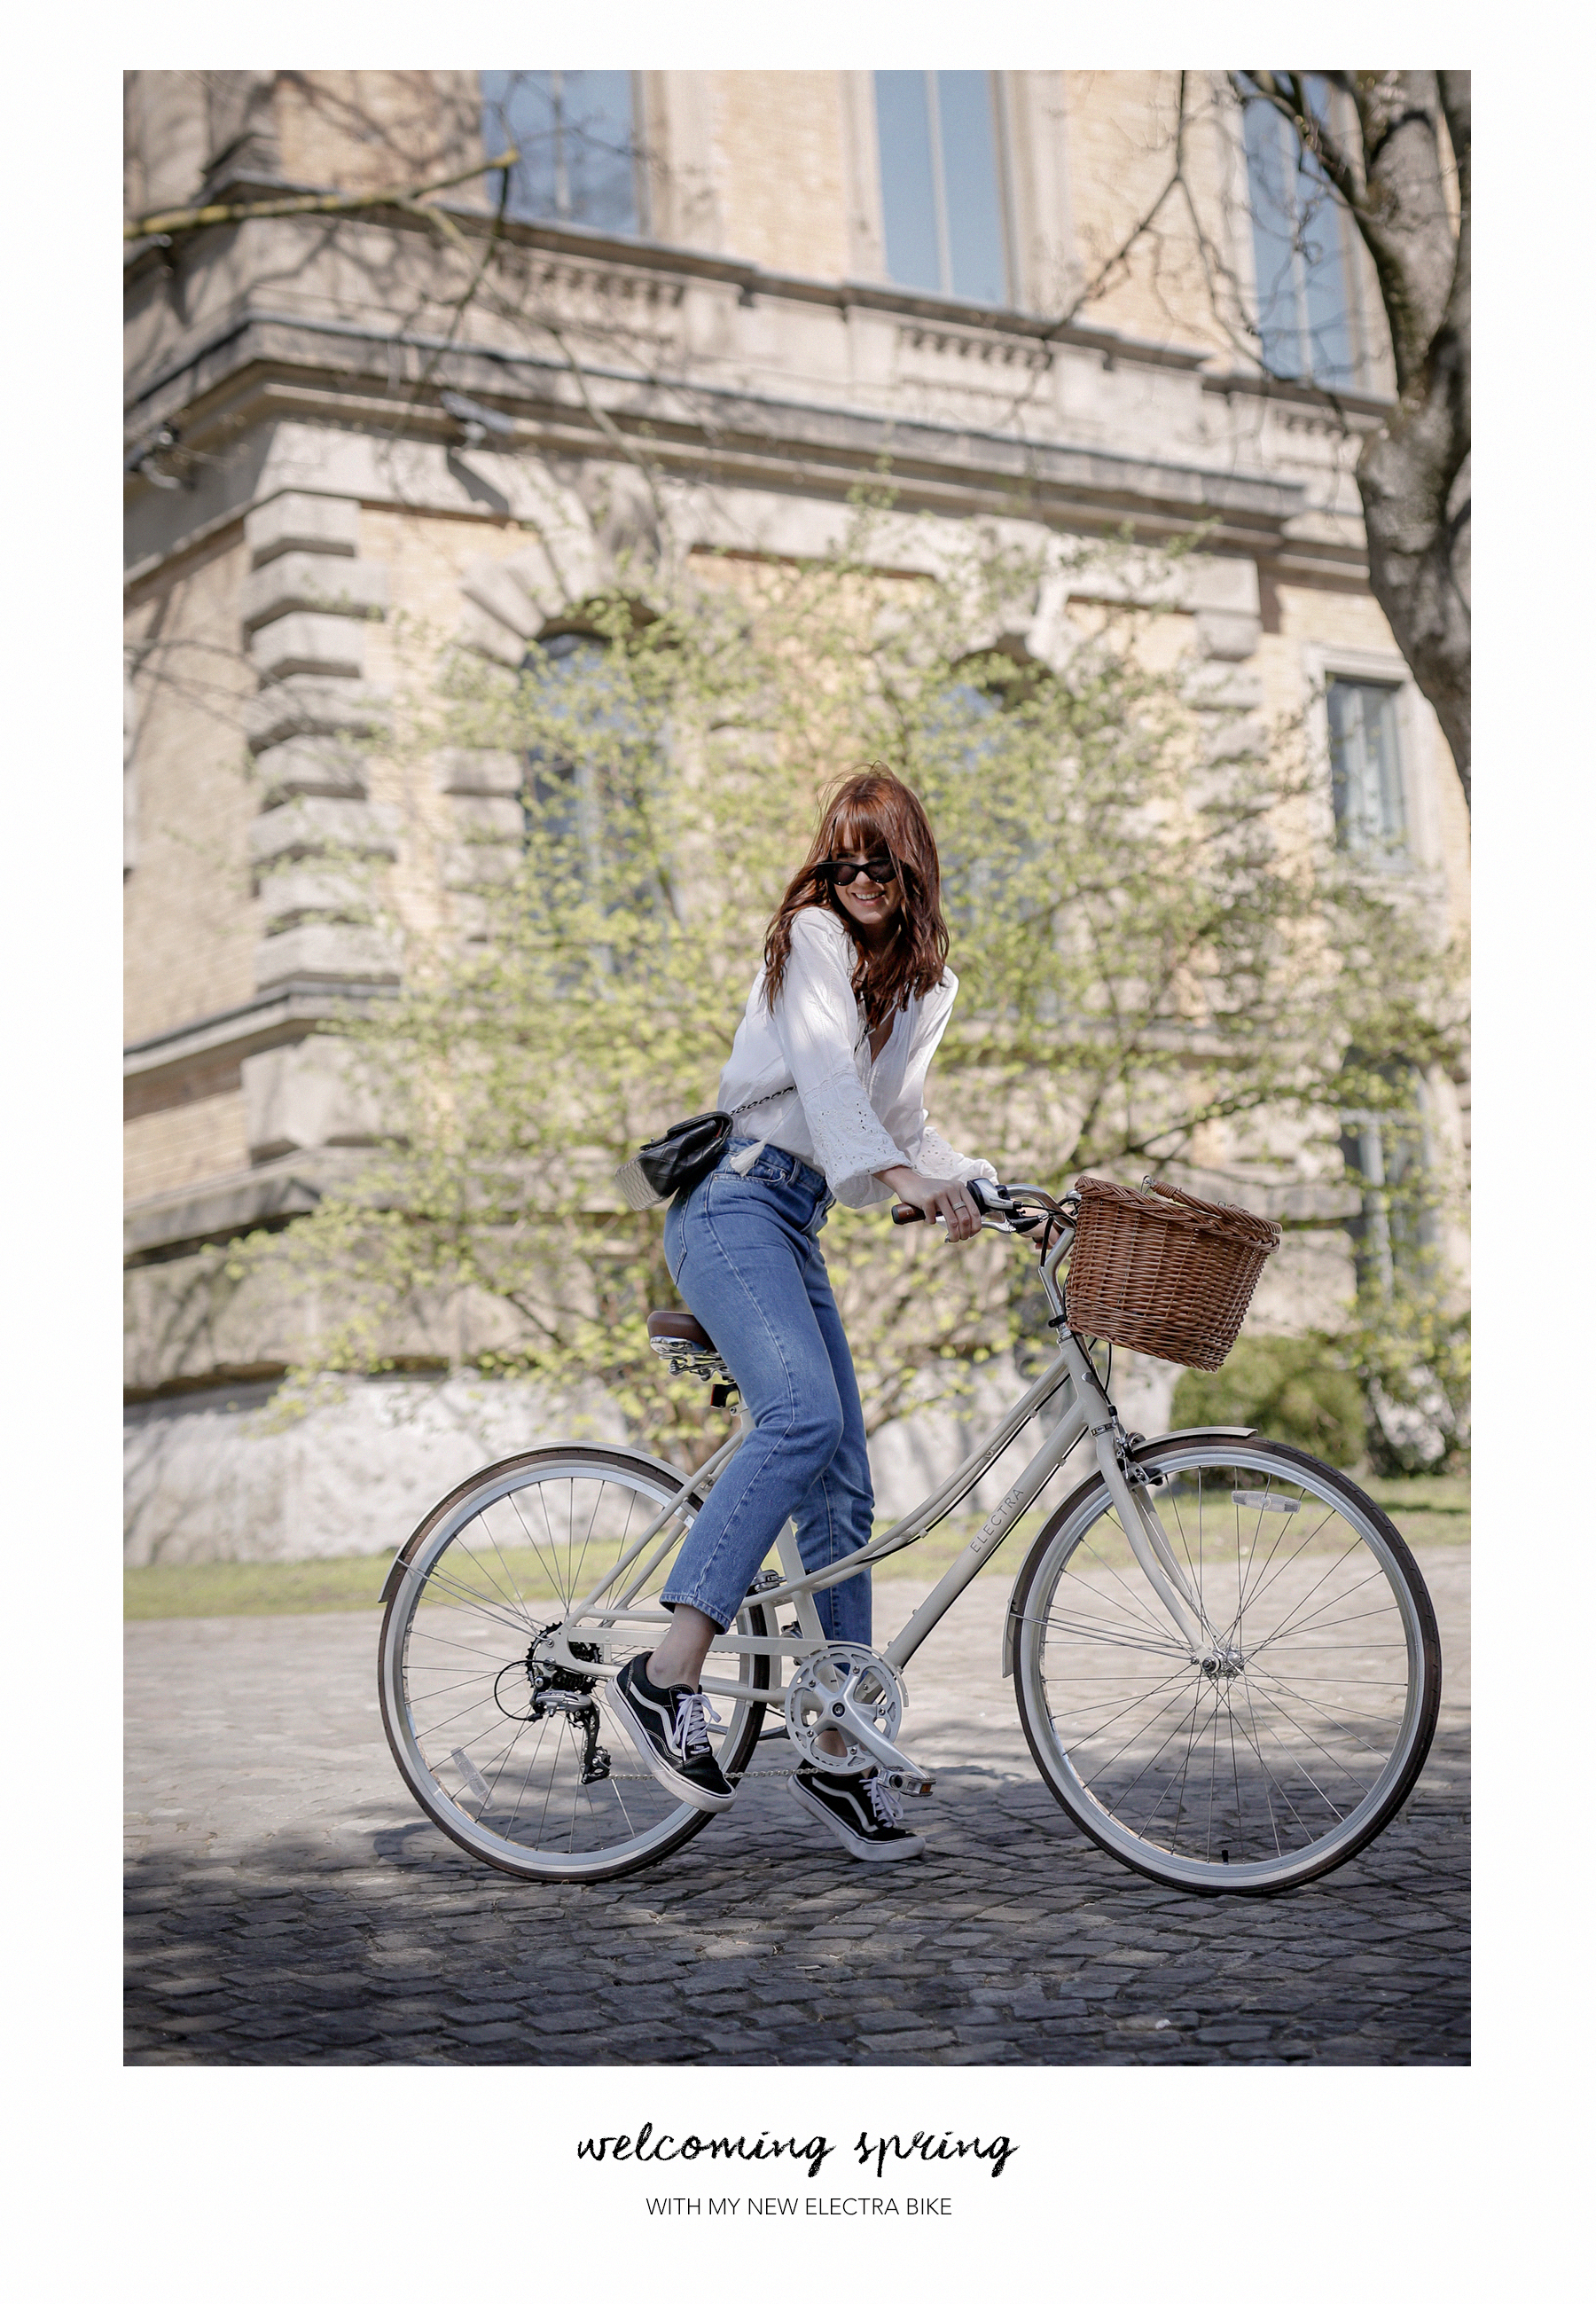 electra bike bicycle fahrrad spring frühling radeln biking loft 7d creme electrabikes catsanddogsblog ricarda schernus modeblog lifestyle blogger styleblog lifestyleblog cats&dogs styleblogger max bechmann fotografie film düsseldorf 7